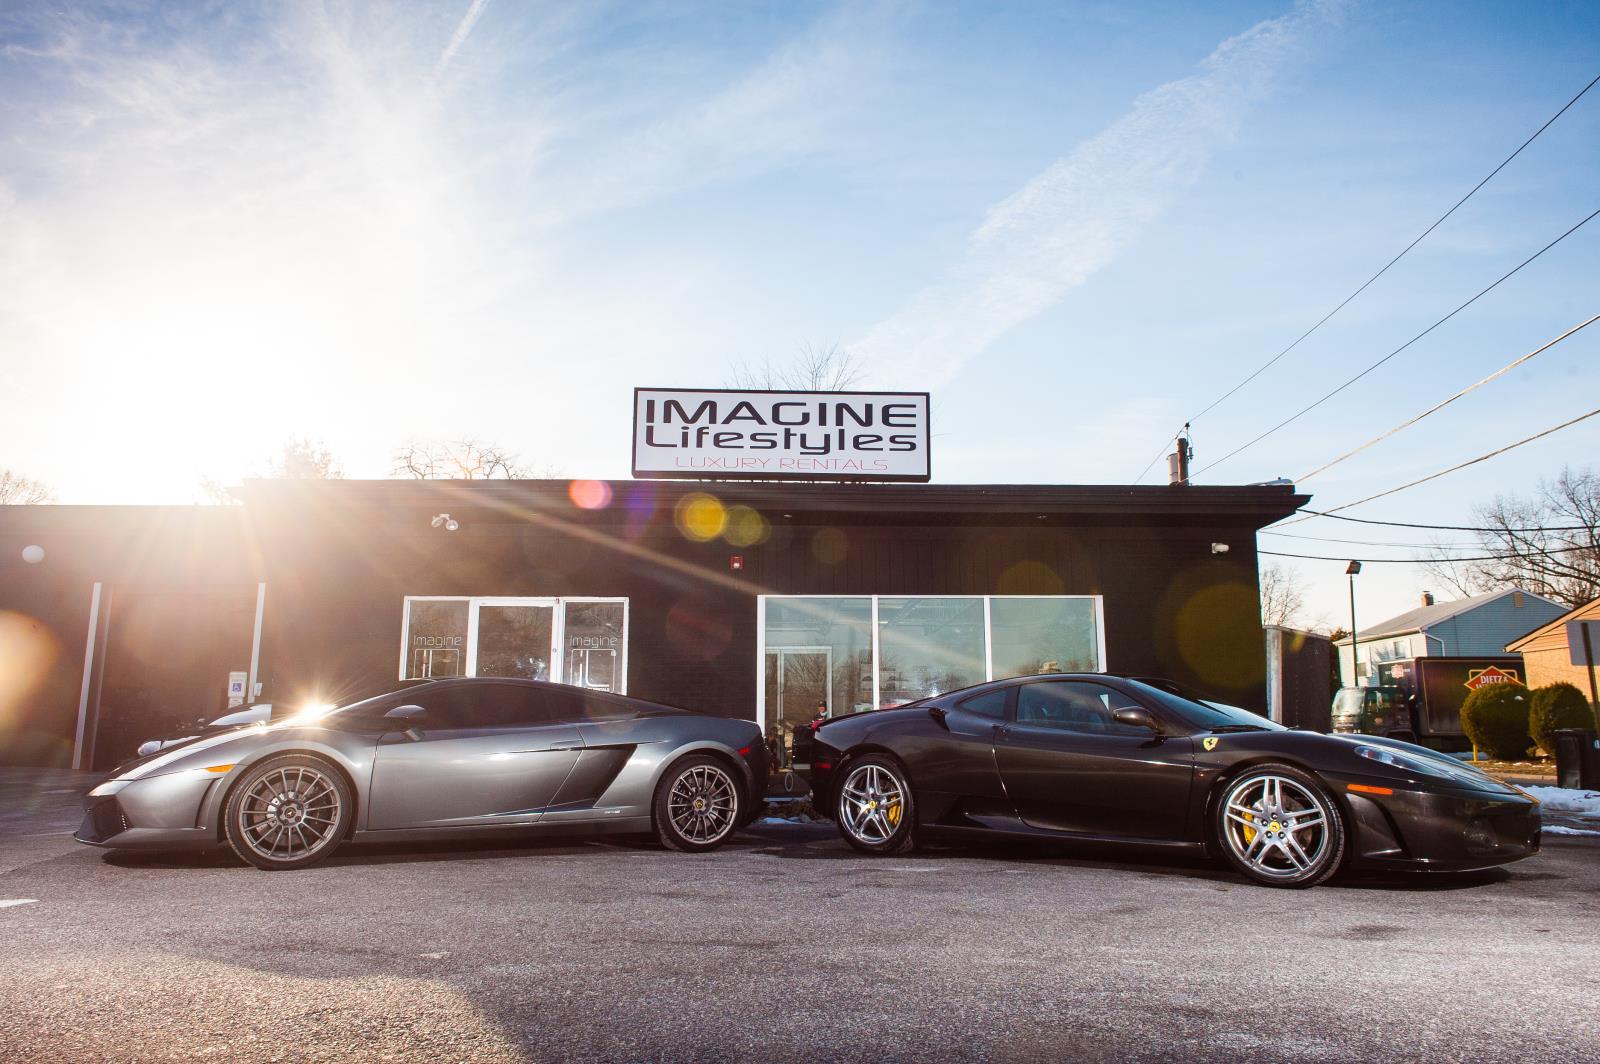 free luxury car rental contest